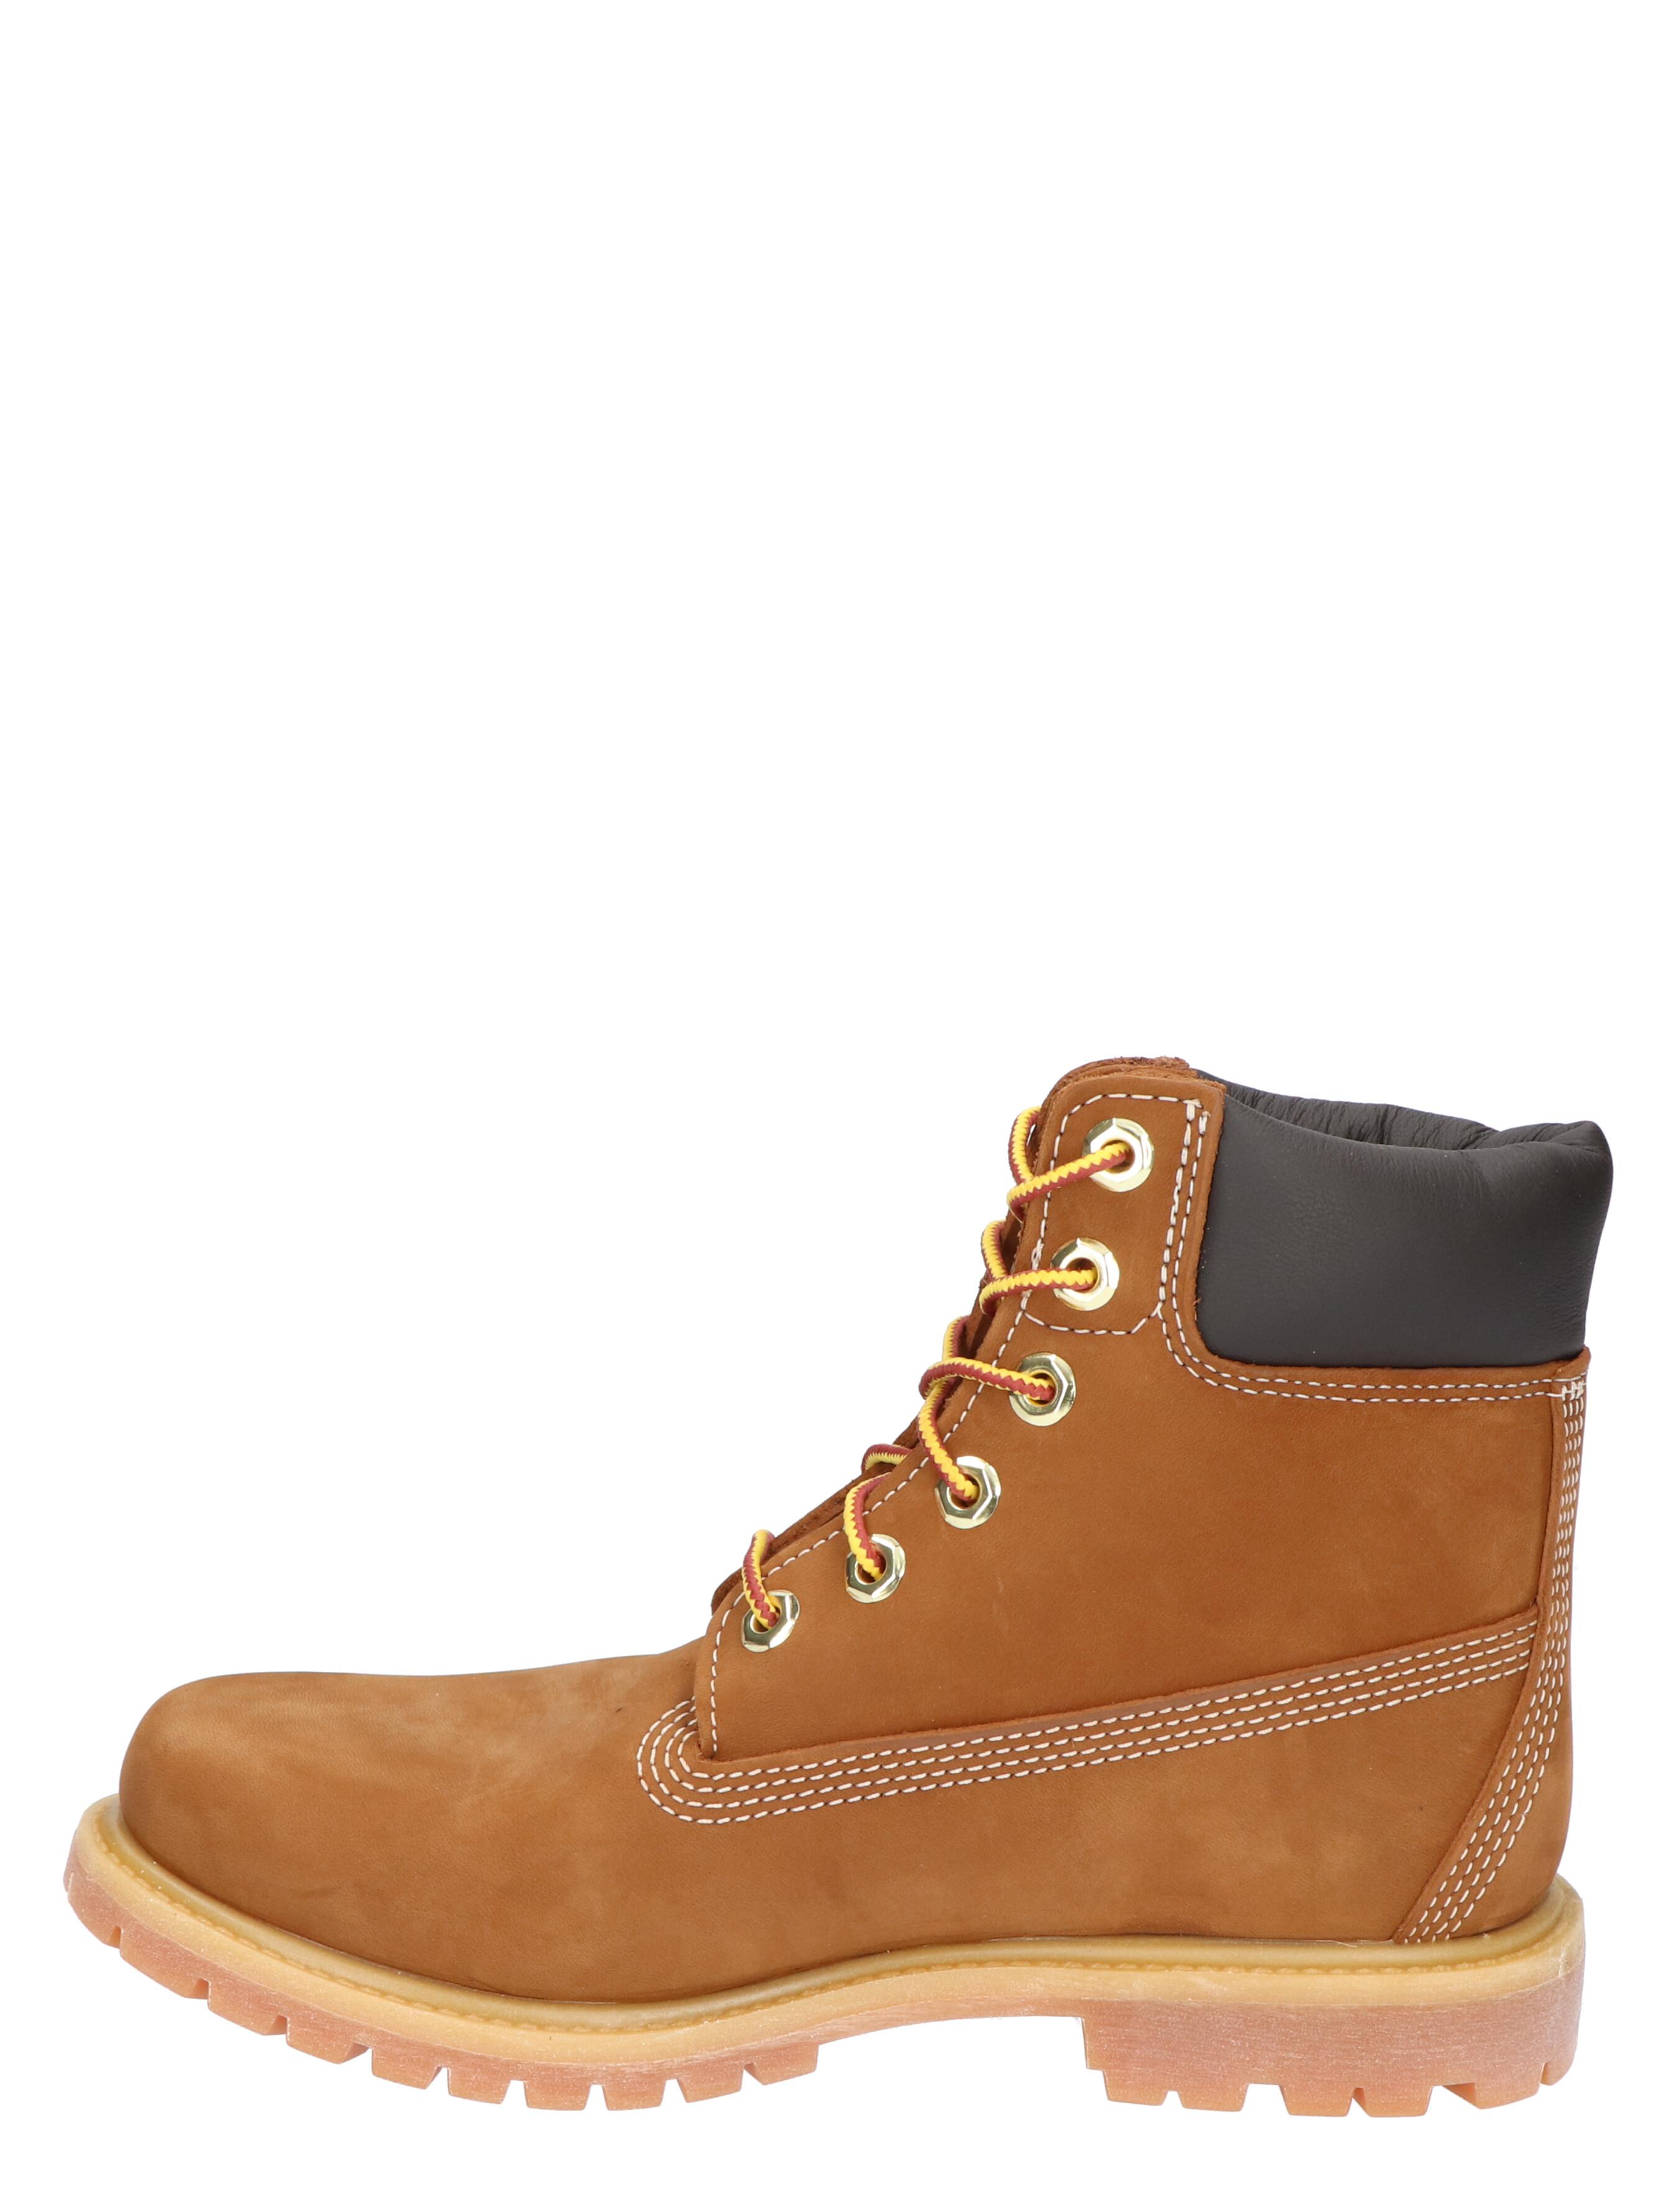 Timberland 6 Inch Premium Boot Rust Boots